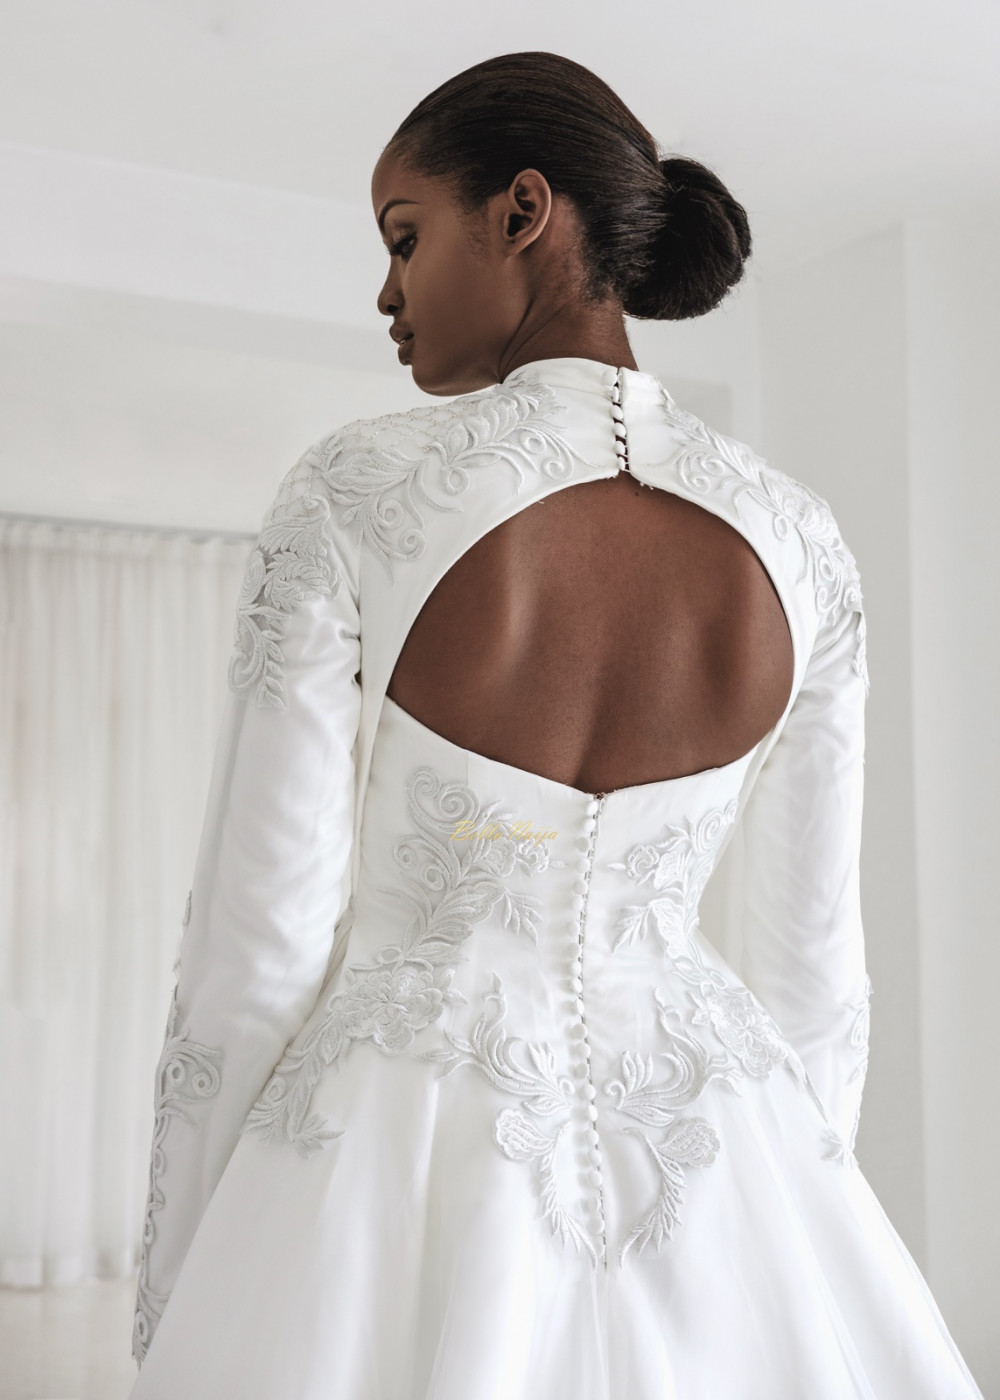 Wedding Dress Steamer 47 Vintage The Andrea Iyamah bridal